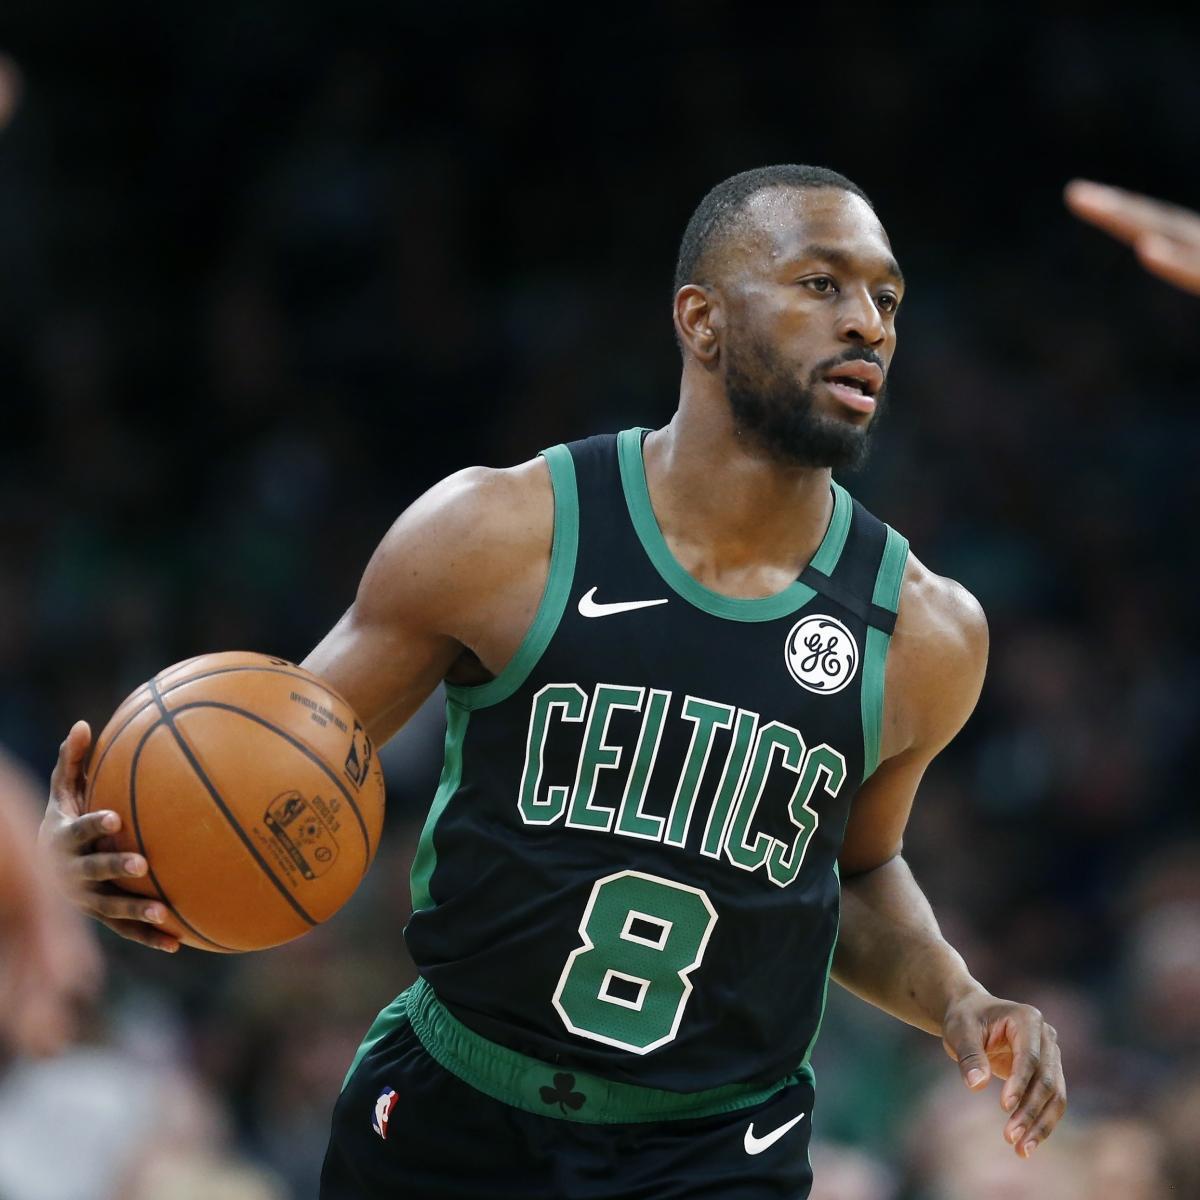 Celtics News: Kemba Walker Injury Latest, Brad Stevens on NBA Restart, More